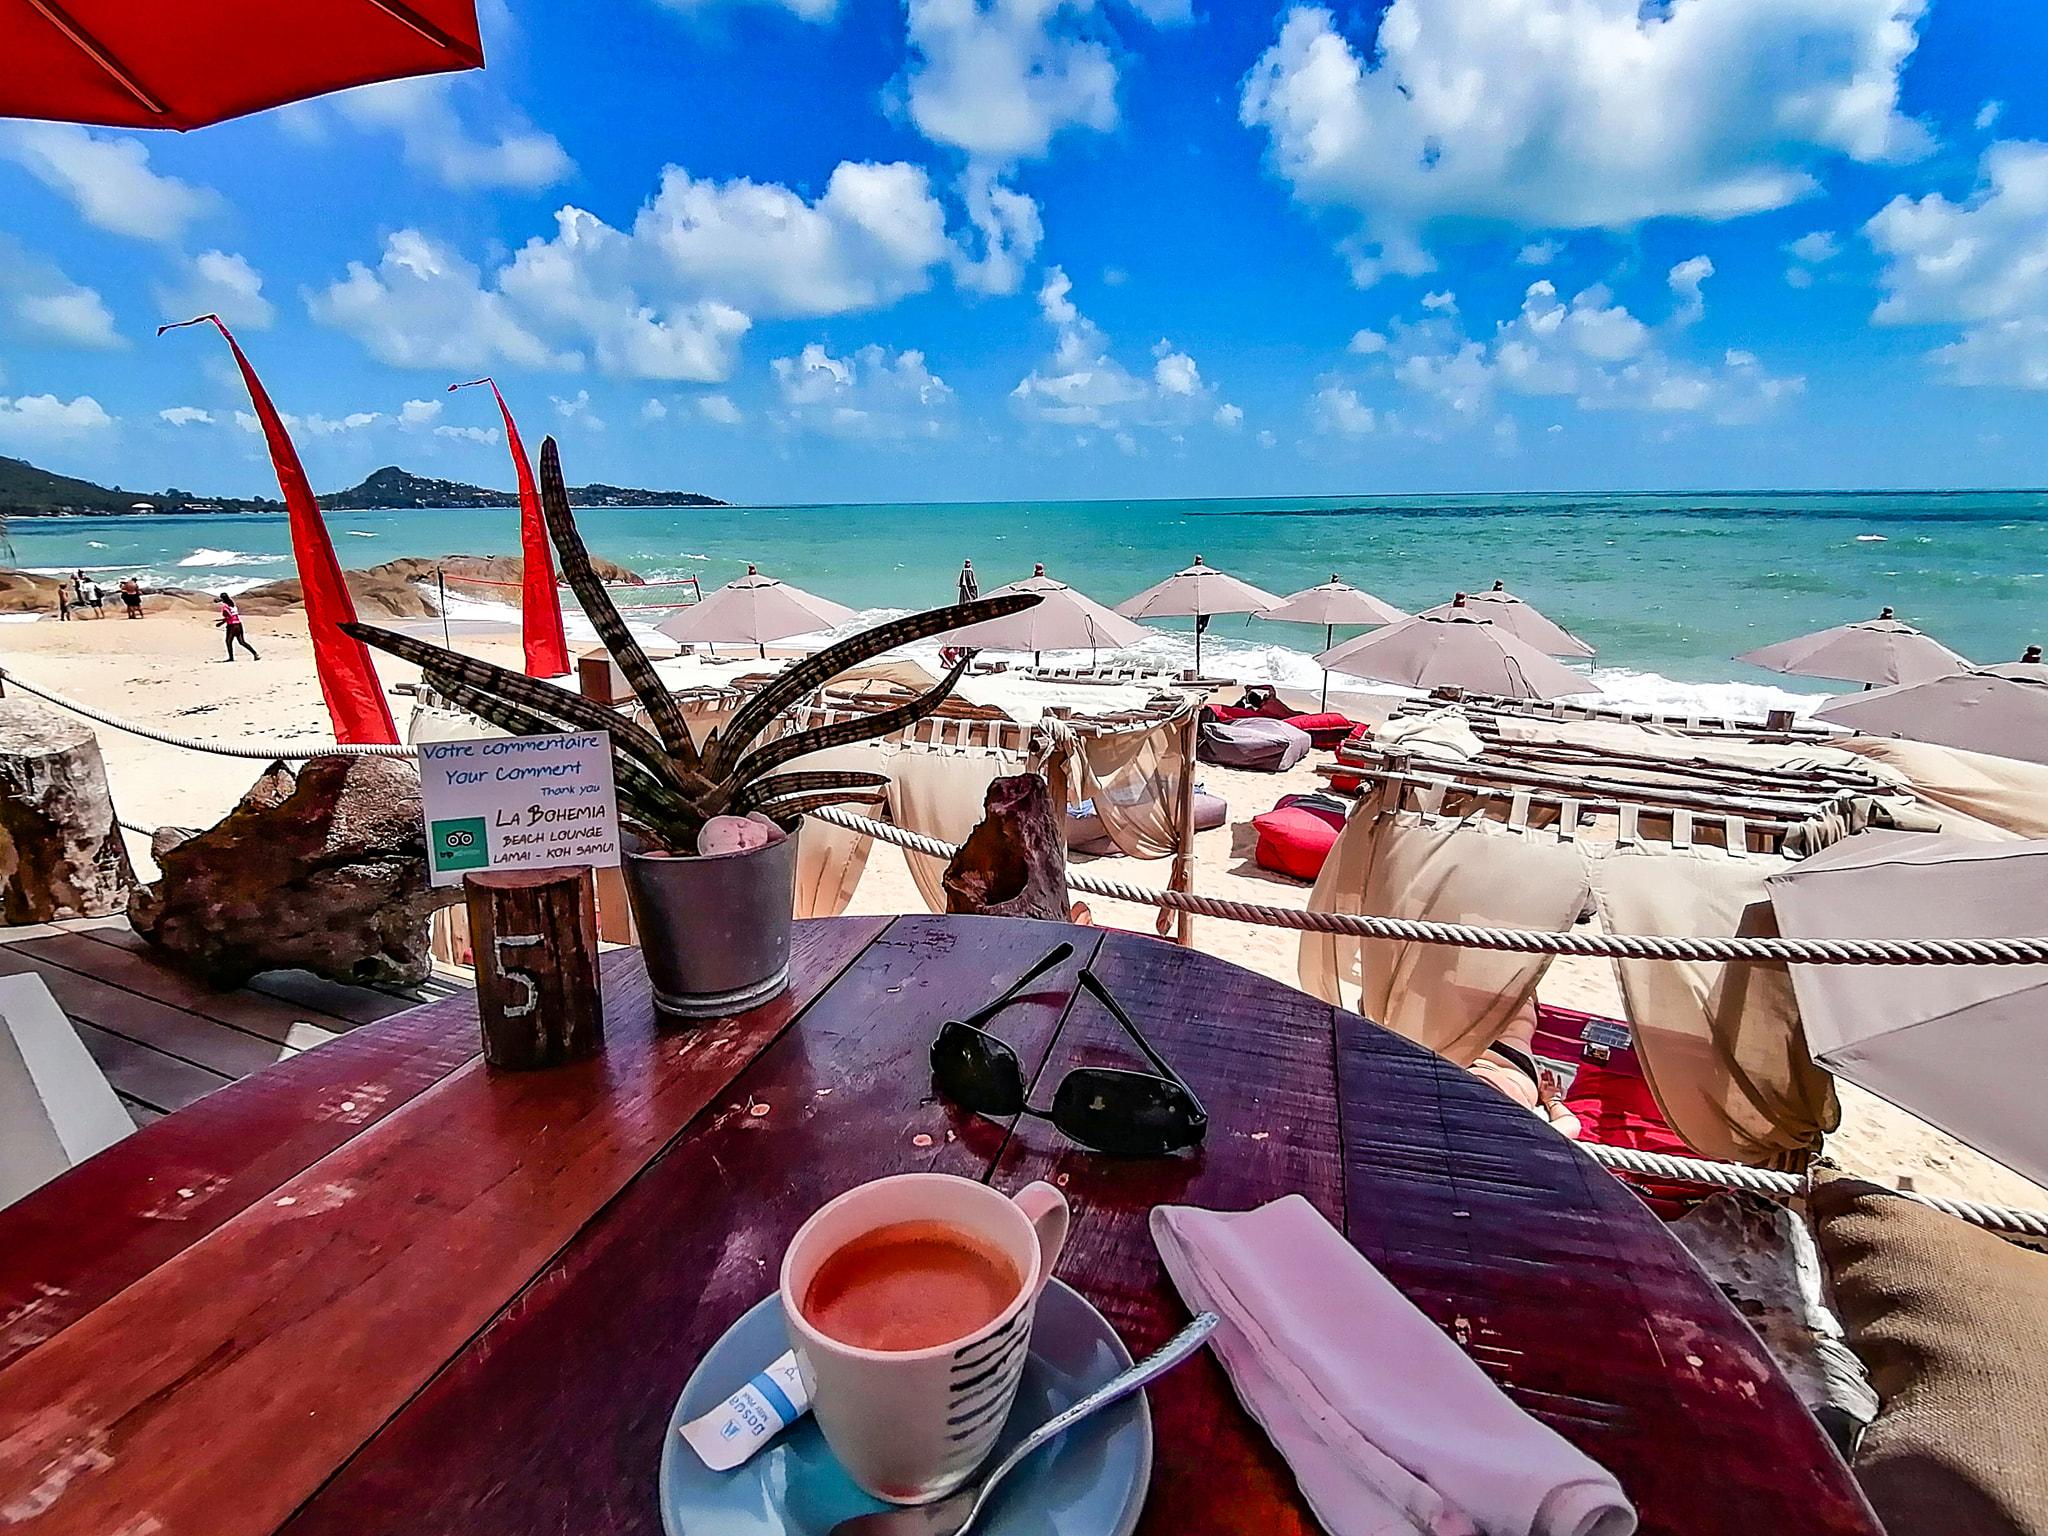 Cafe en terrasse vue mer a la Bohemia Beach Lounge a Koh Samui, Beach Club.